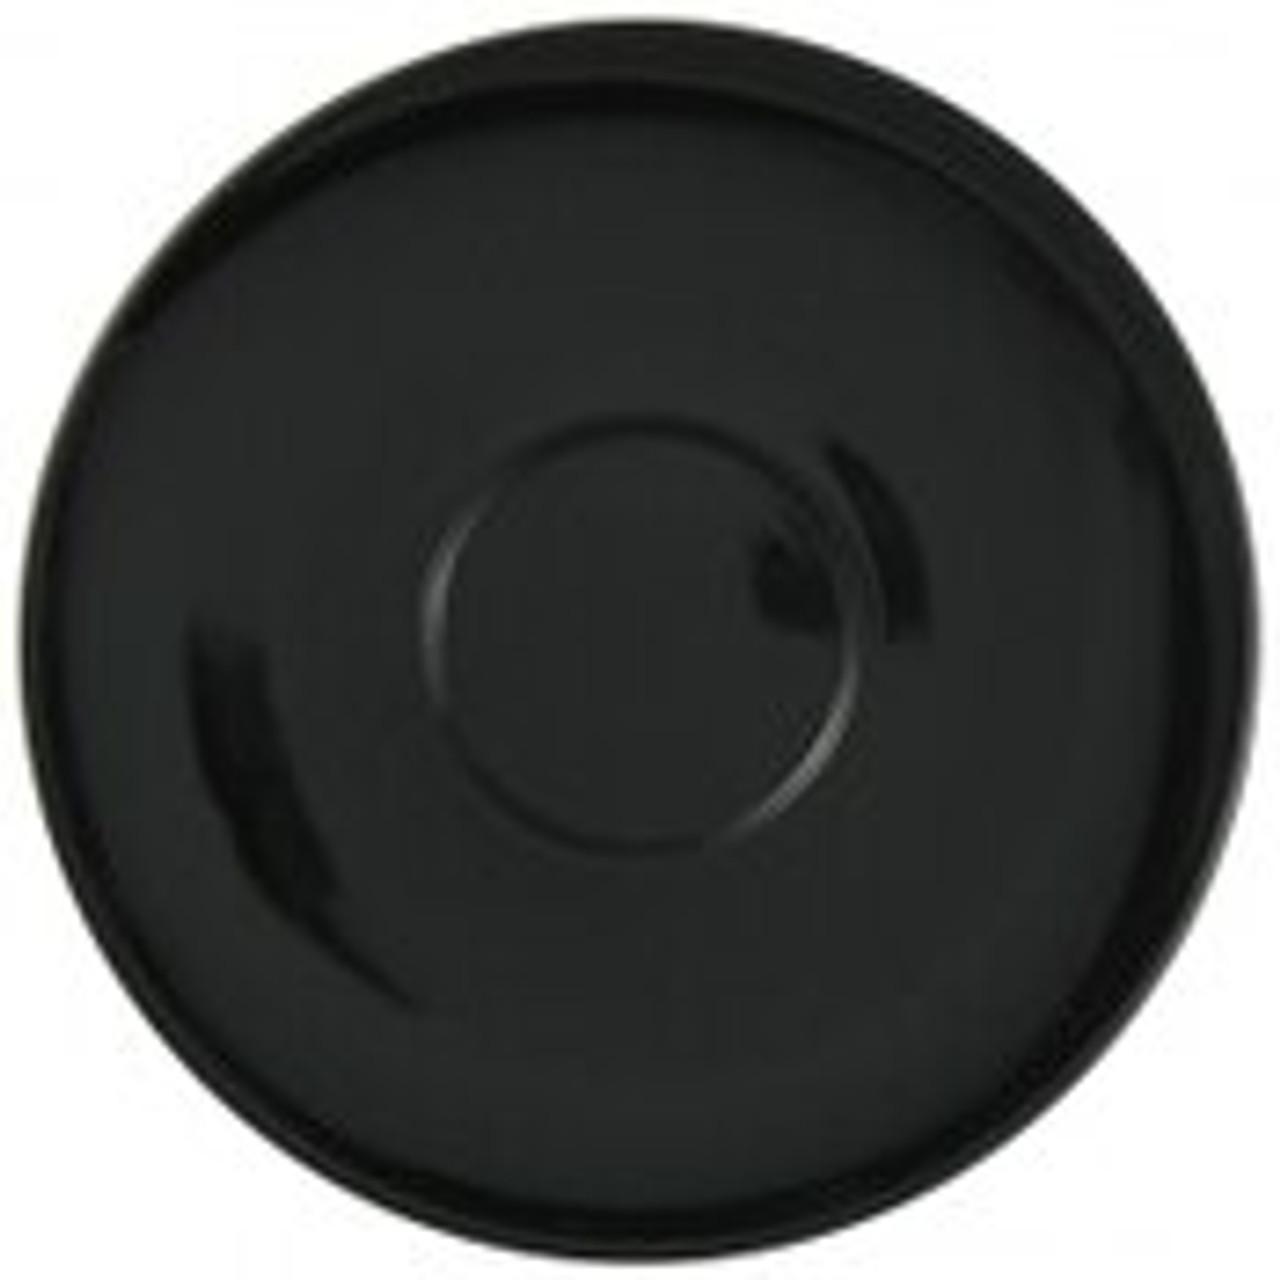 "Revolution Revware Saucer, 4.5"", black"